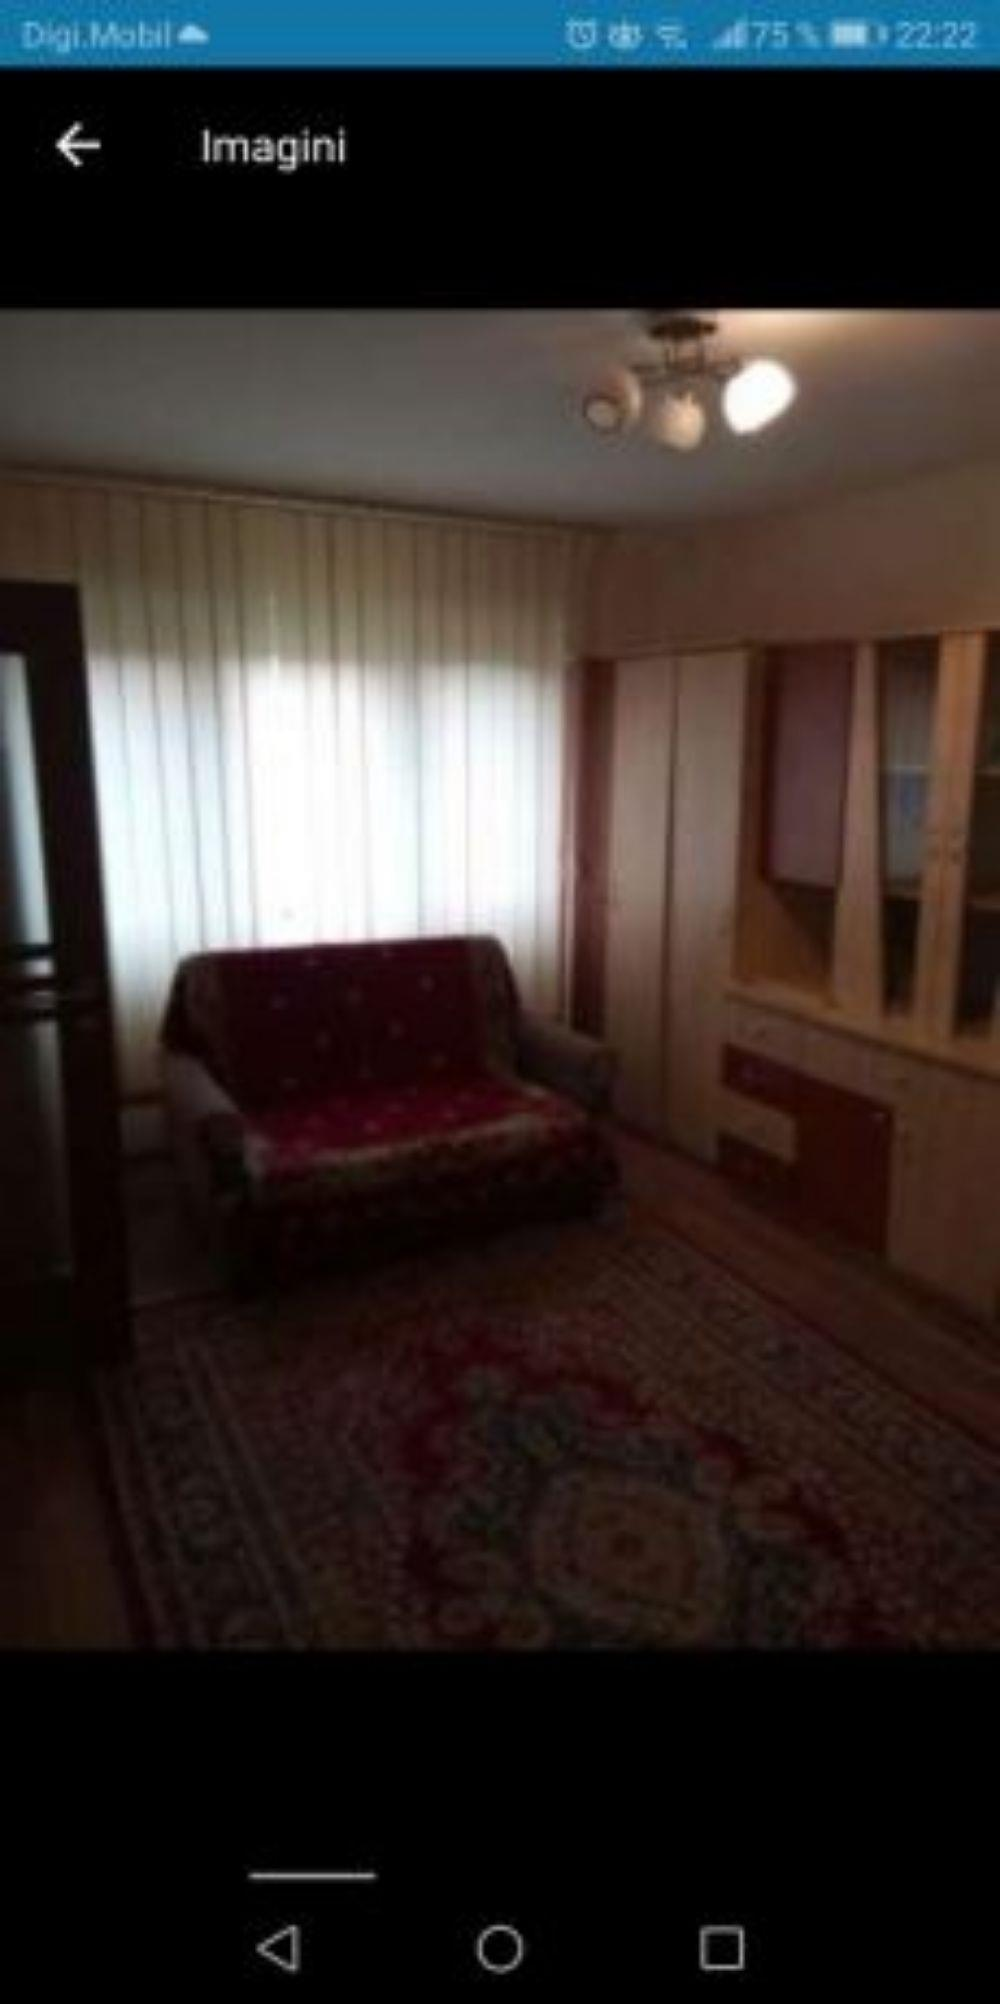 Chirie ap 2cam sau regim hotelier  - imagine 6